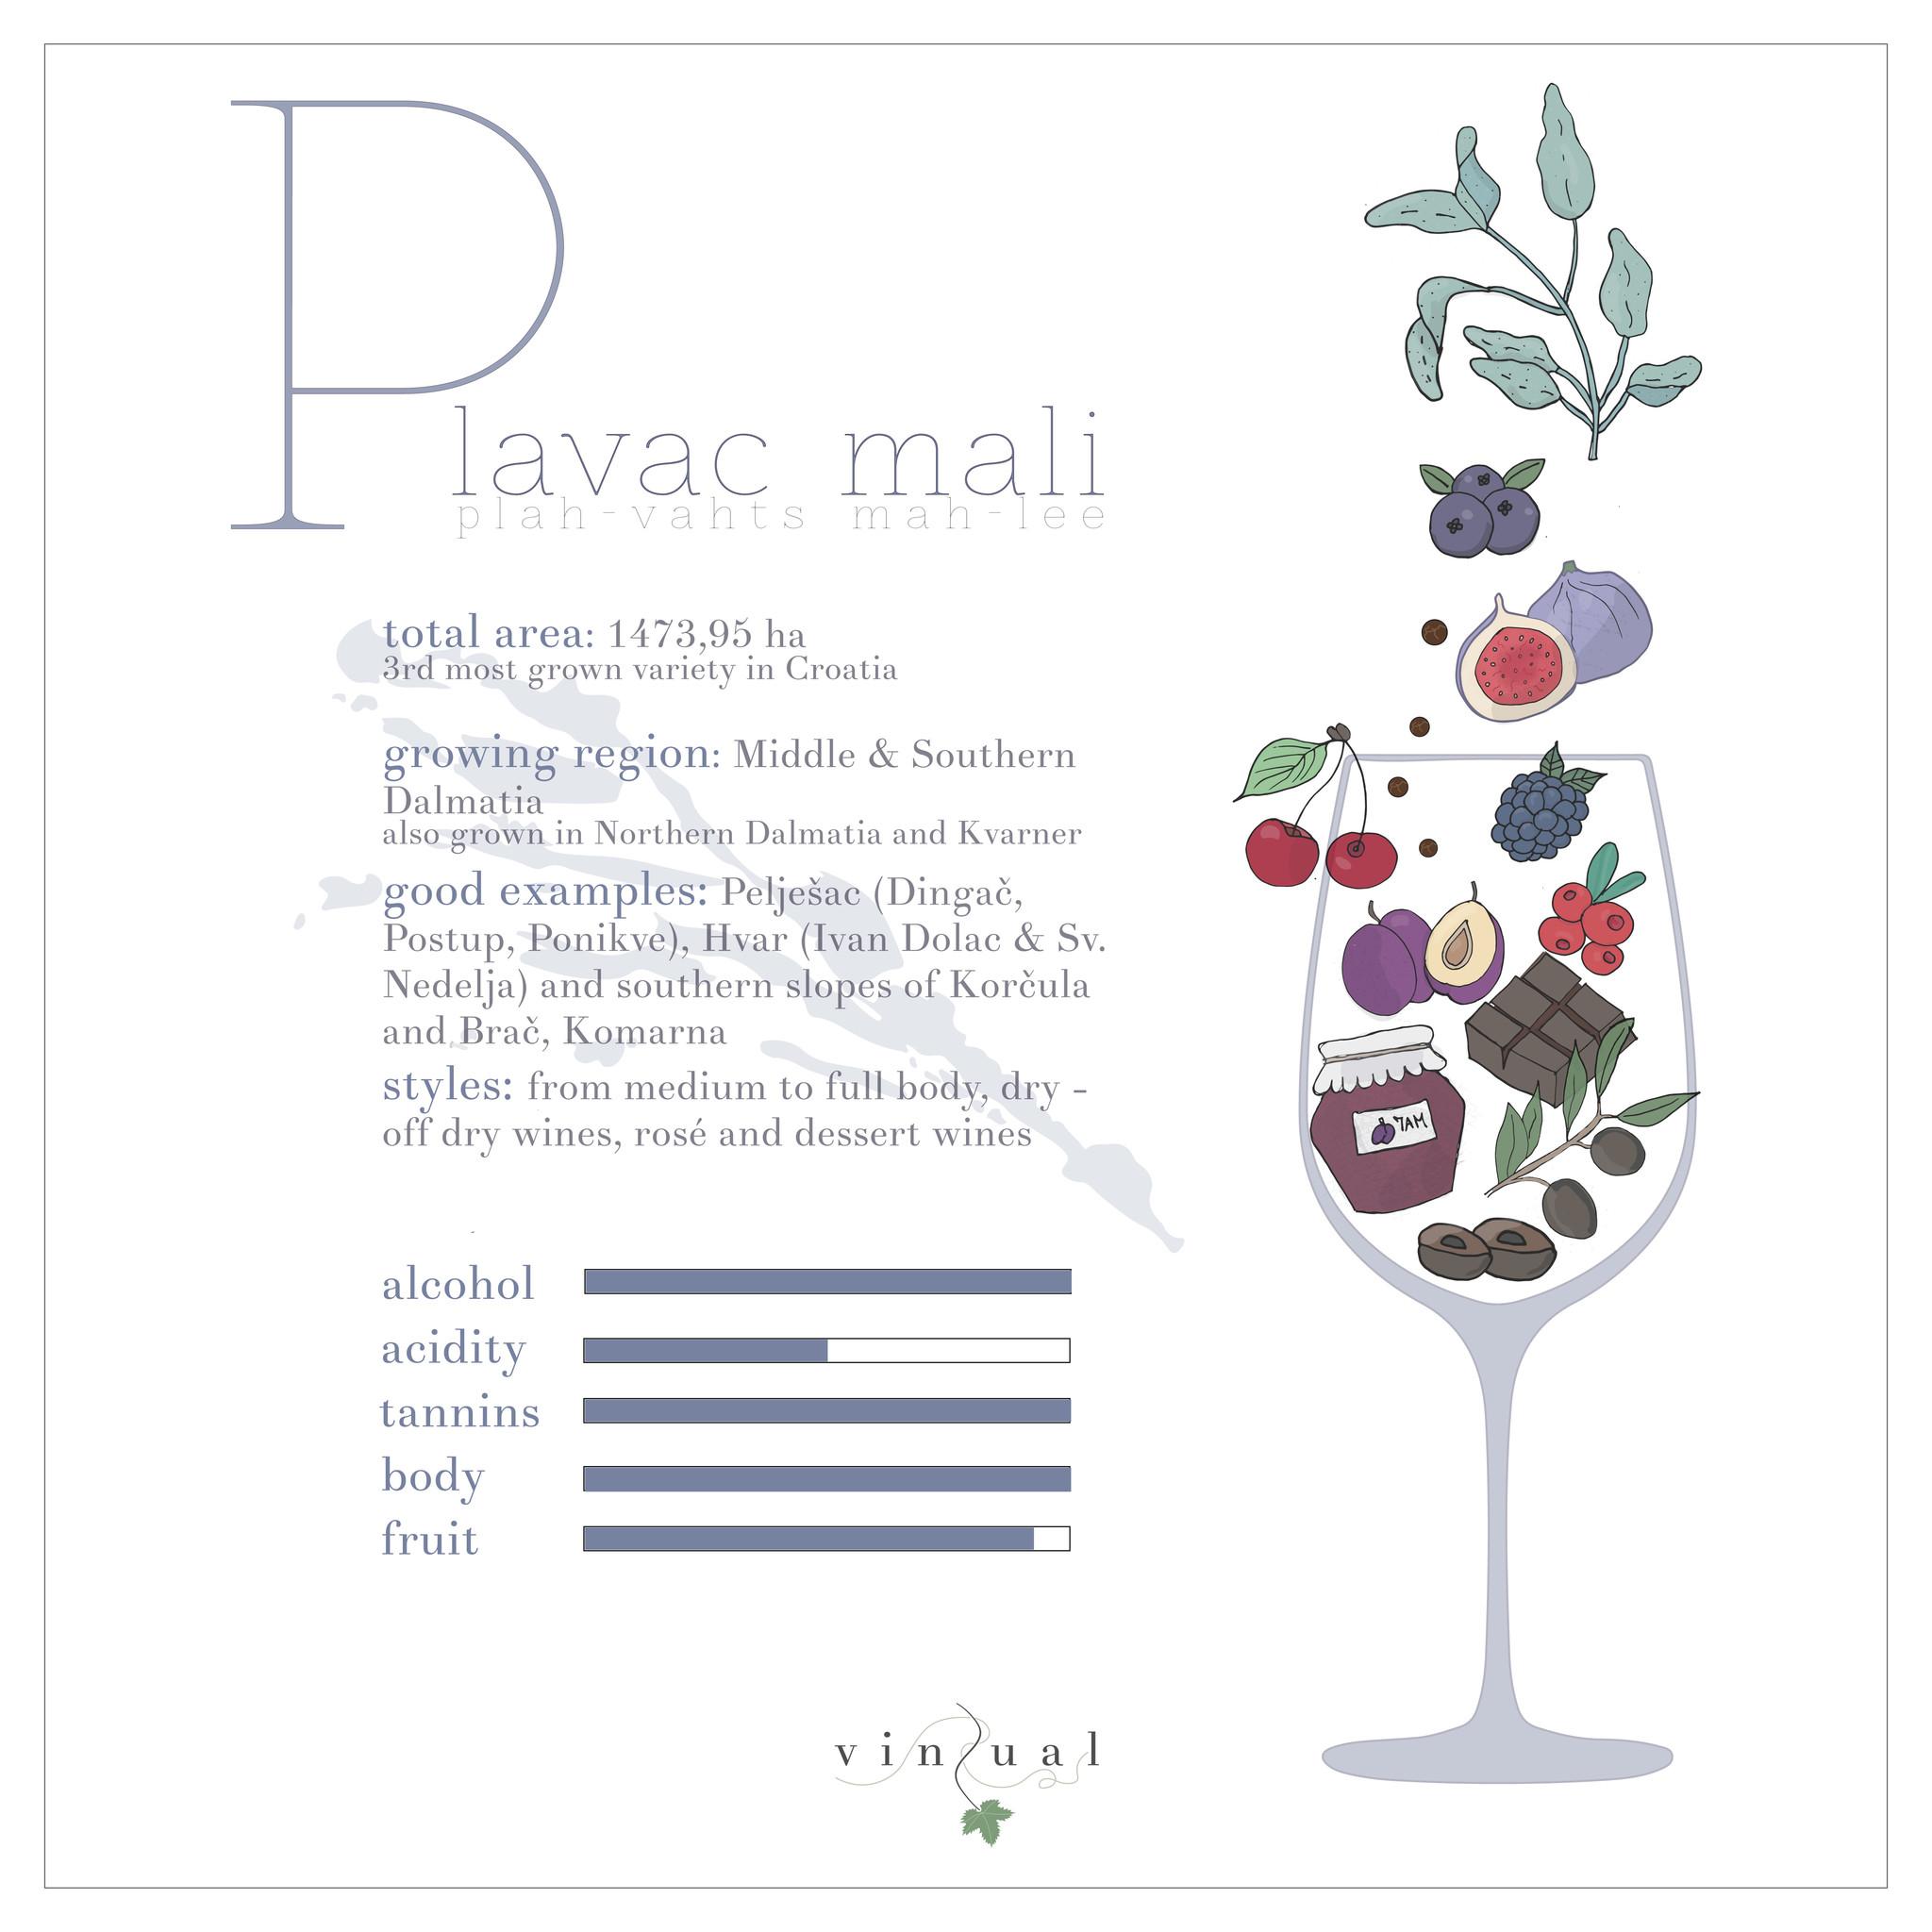 Plavac mali profile by Vinzual